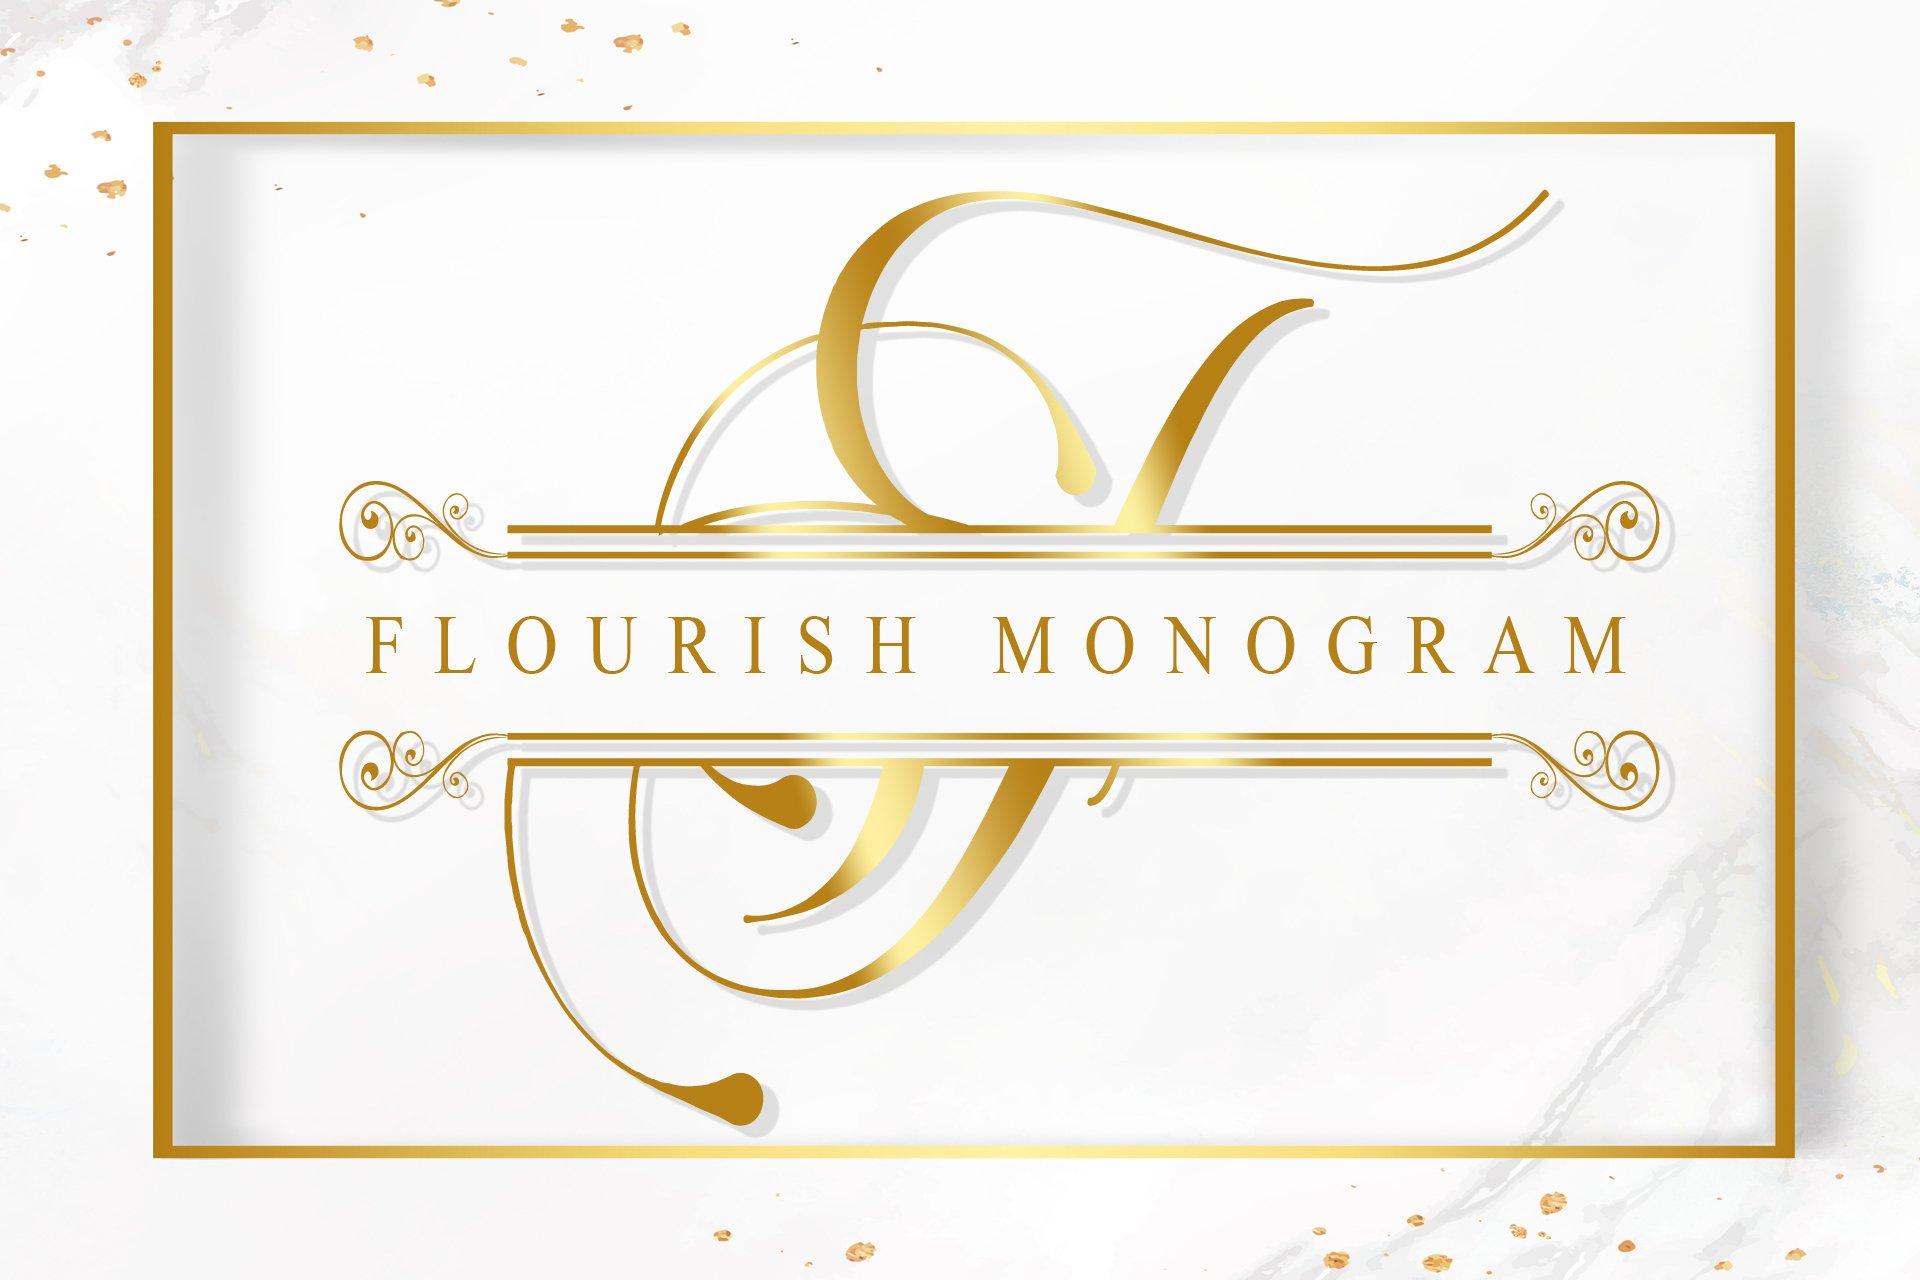 Flourish Monogram example image 1